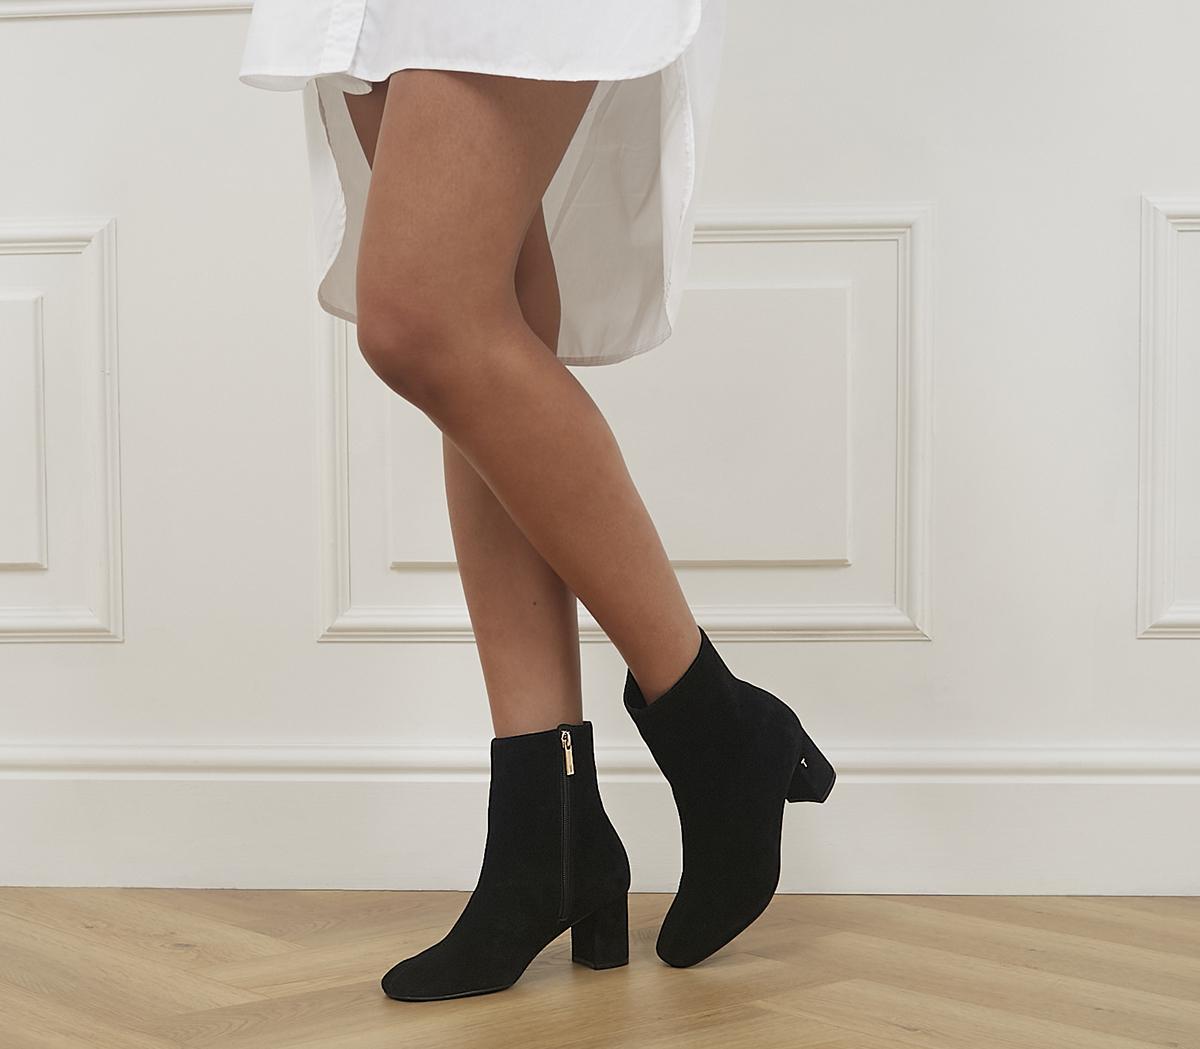 Neomie Chunky Heeled Boots